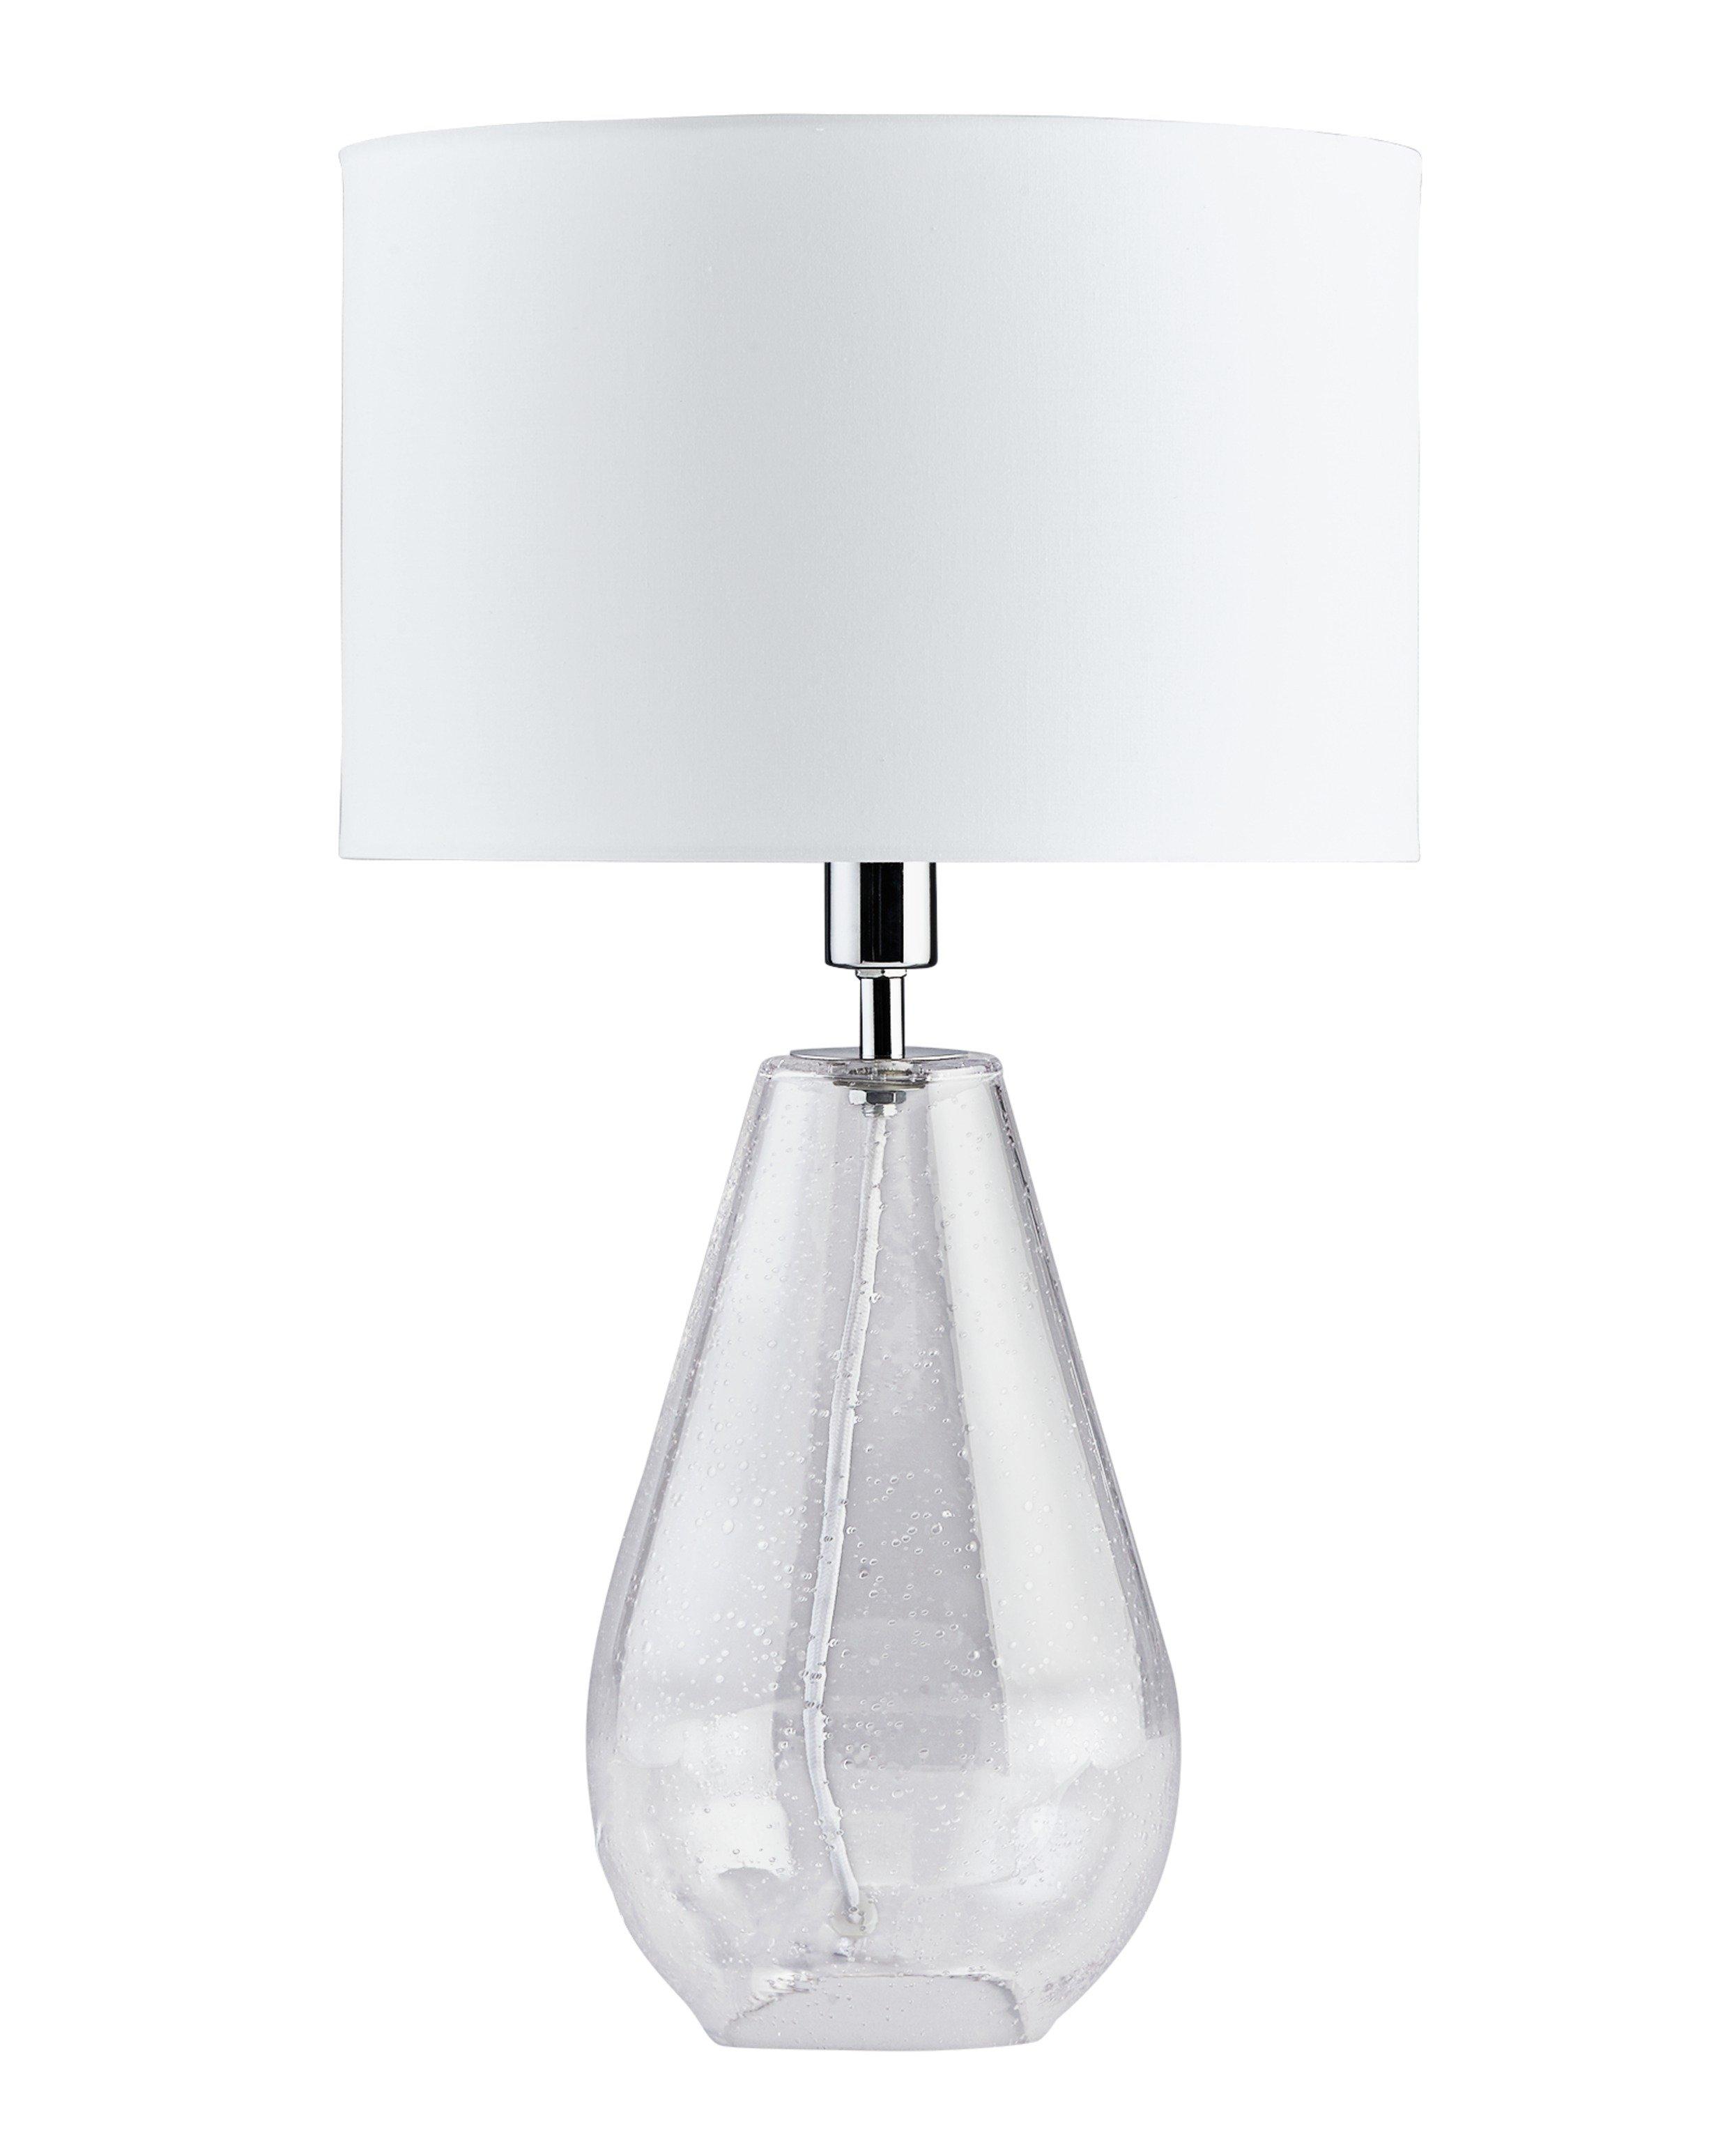 Argos Home Darley Bubble Glass Table Lamp 7093247 Argos Price